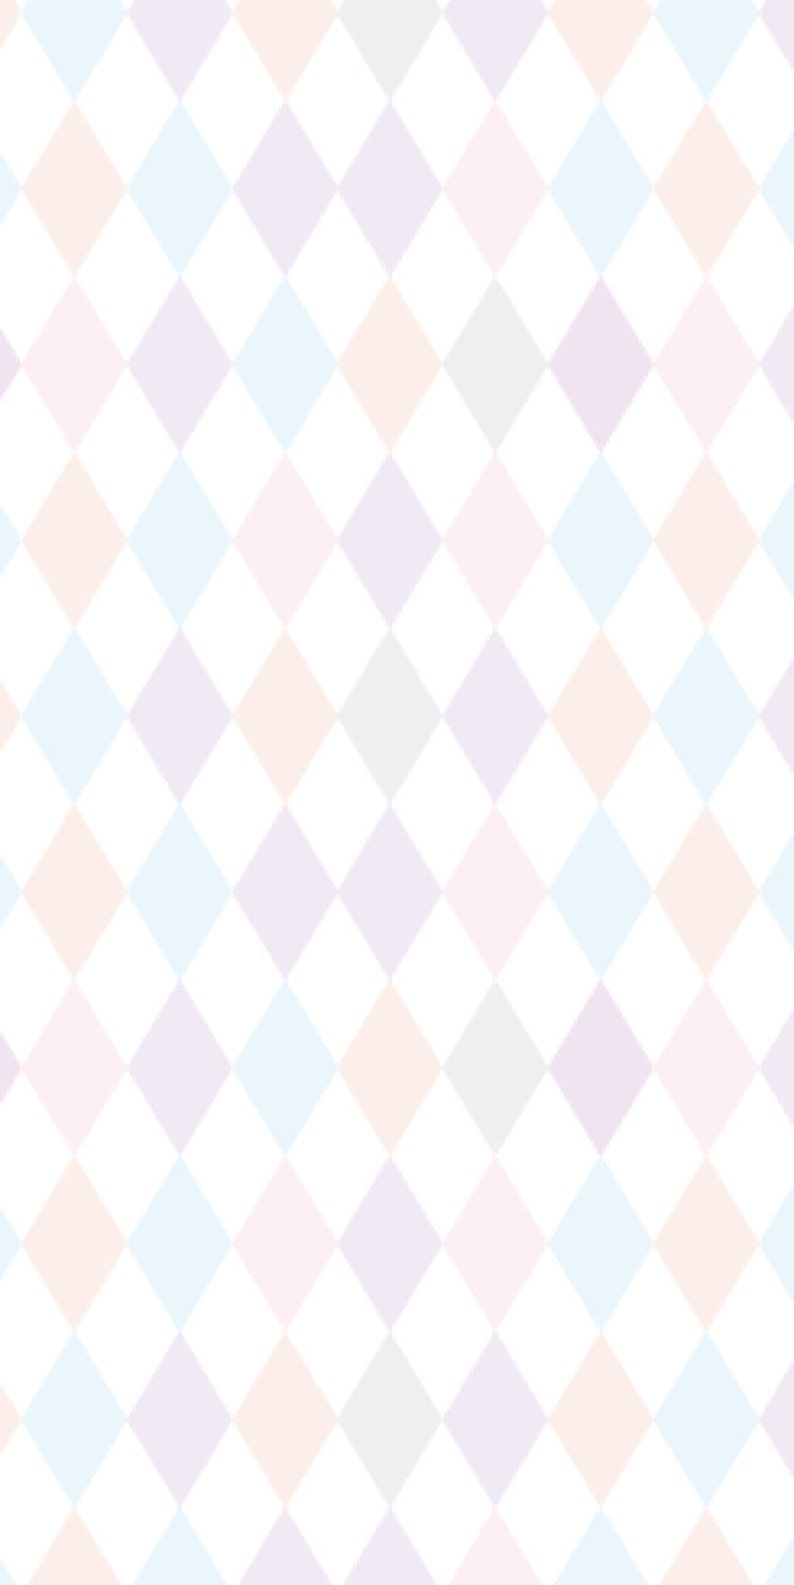 nursery wallpaper Peel and stick wallpaper Removable Wallpaper Self adhesive pastel wallpaper nursery decor diamond wallpaper